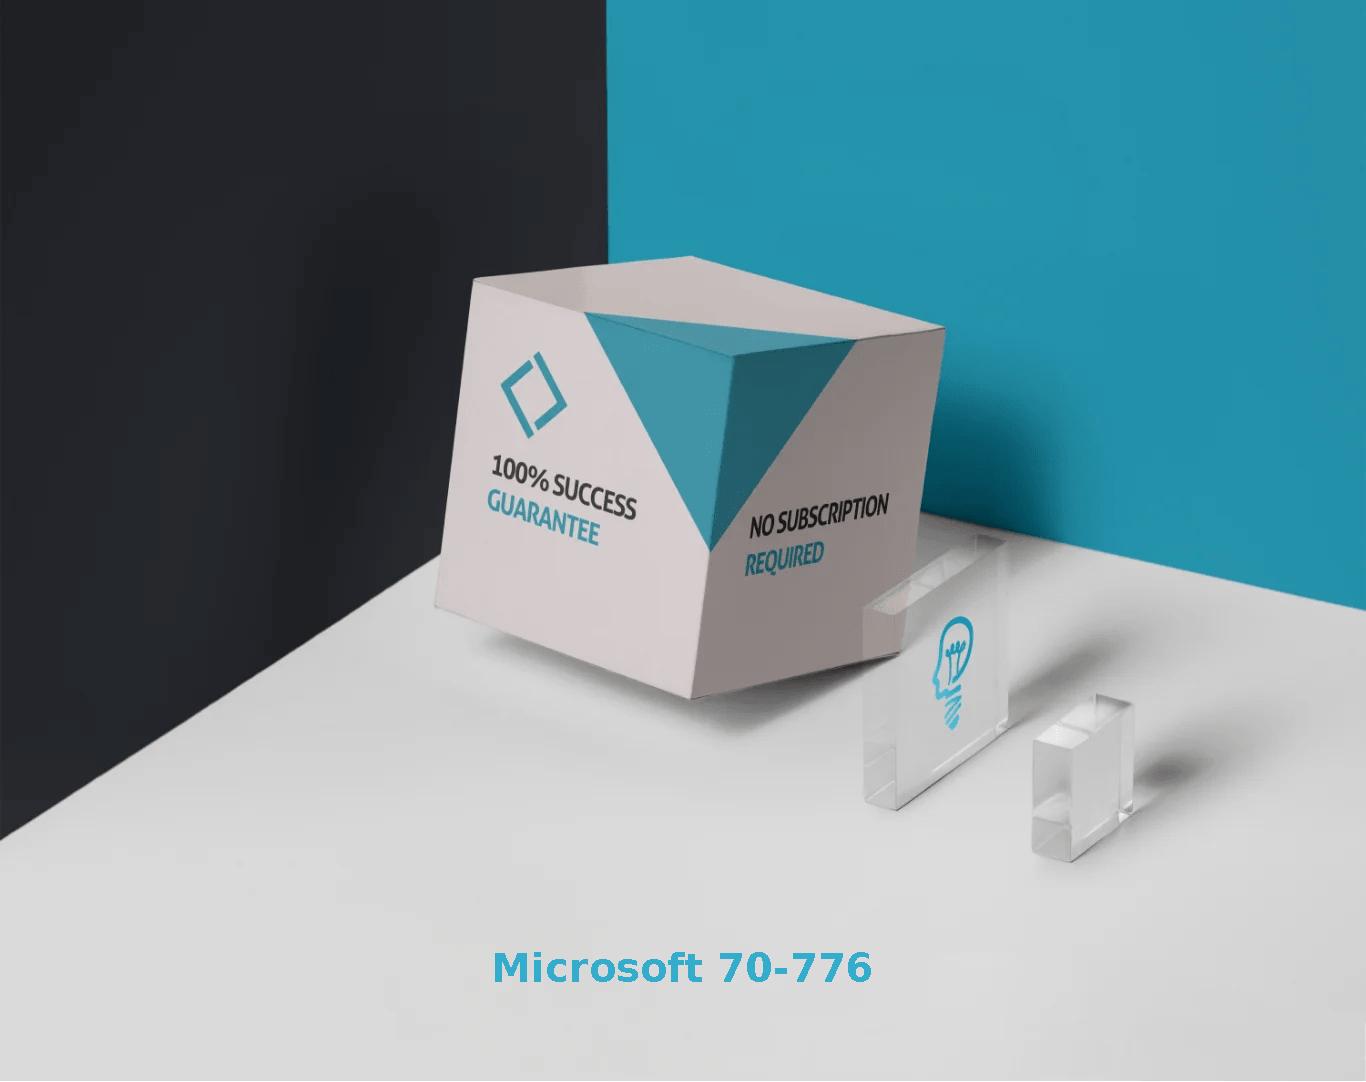 Microsoft 70-776 Exams